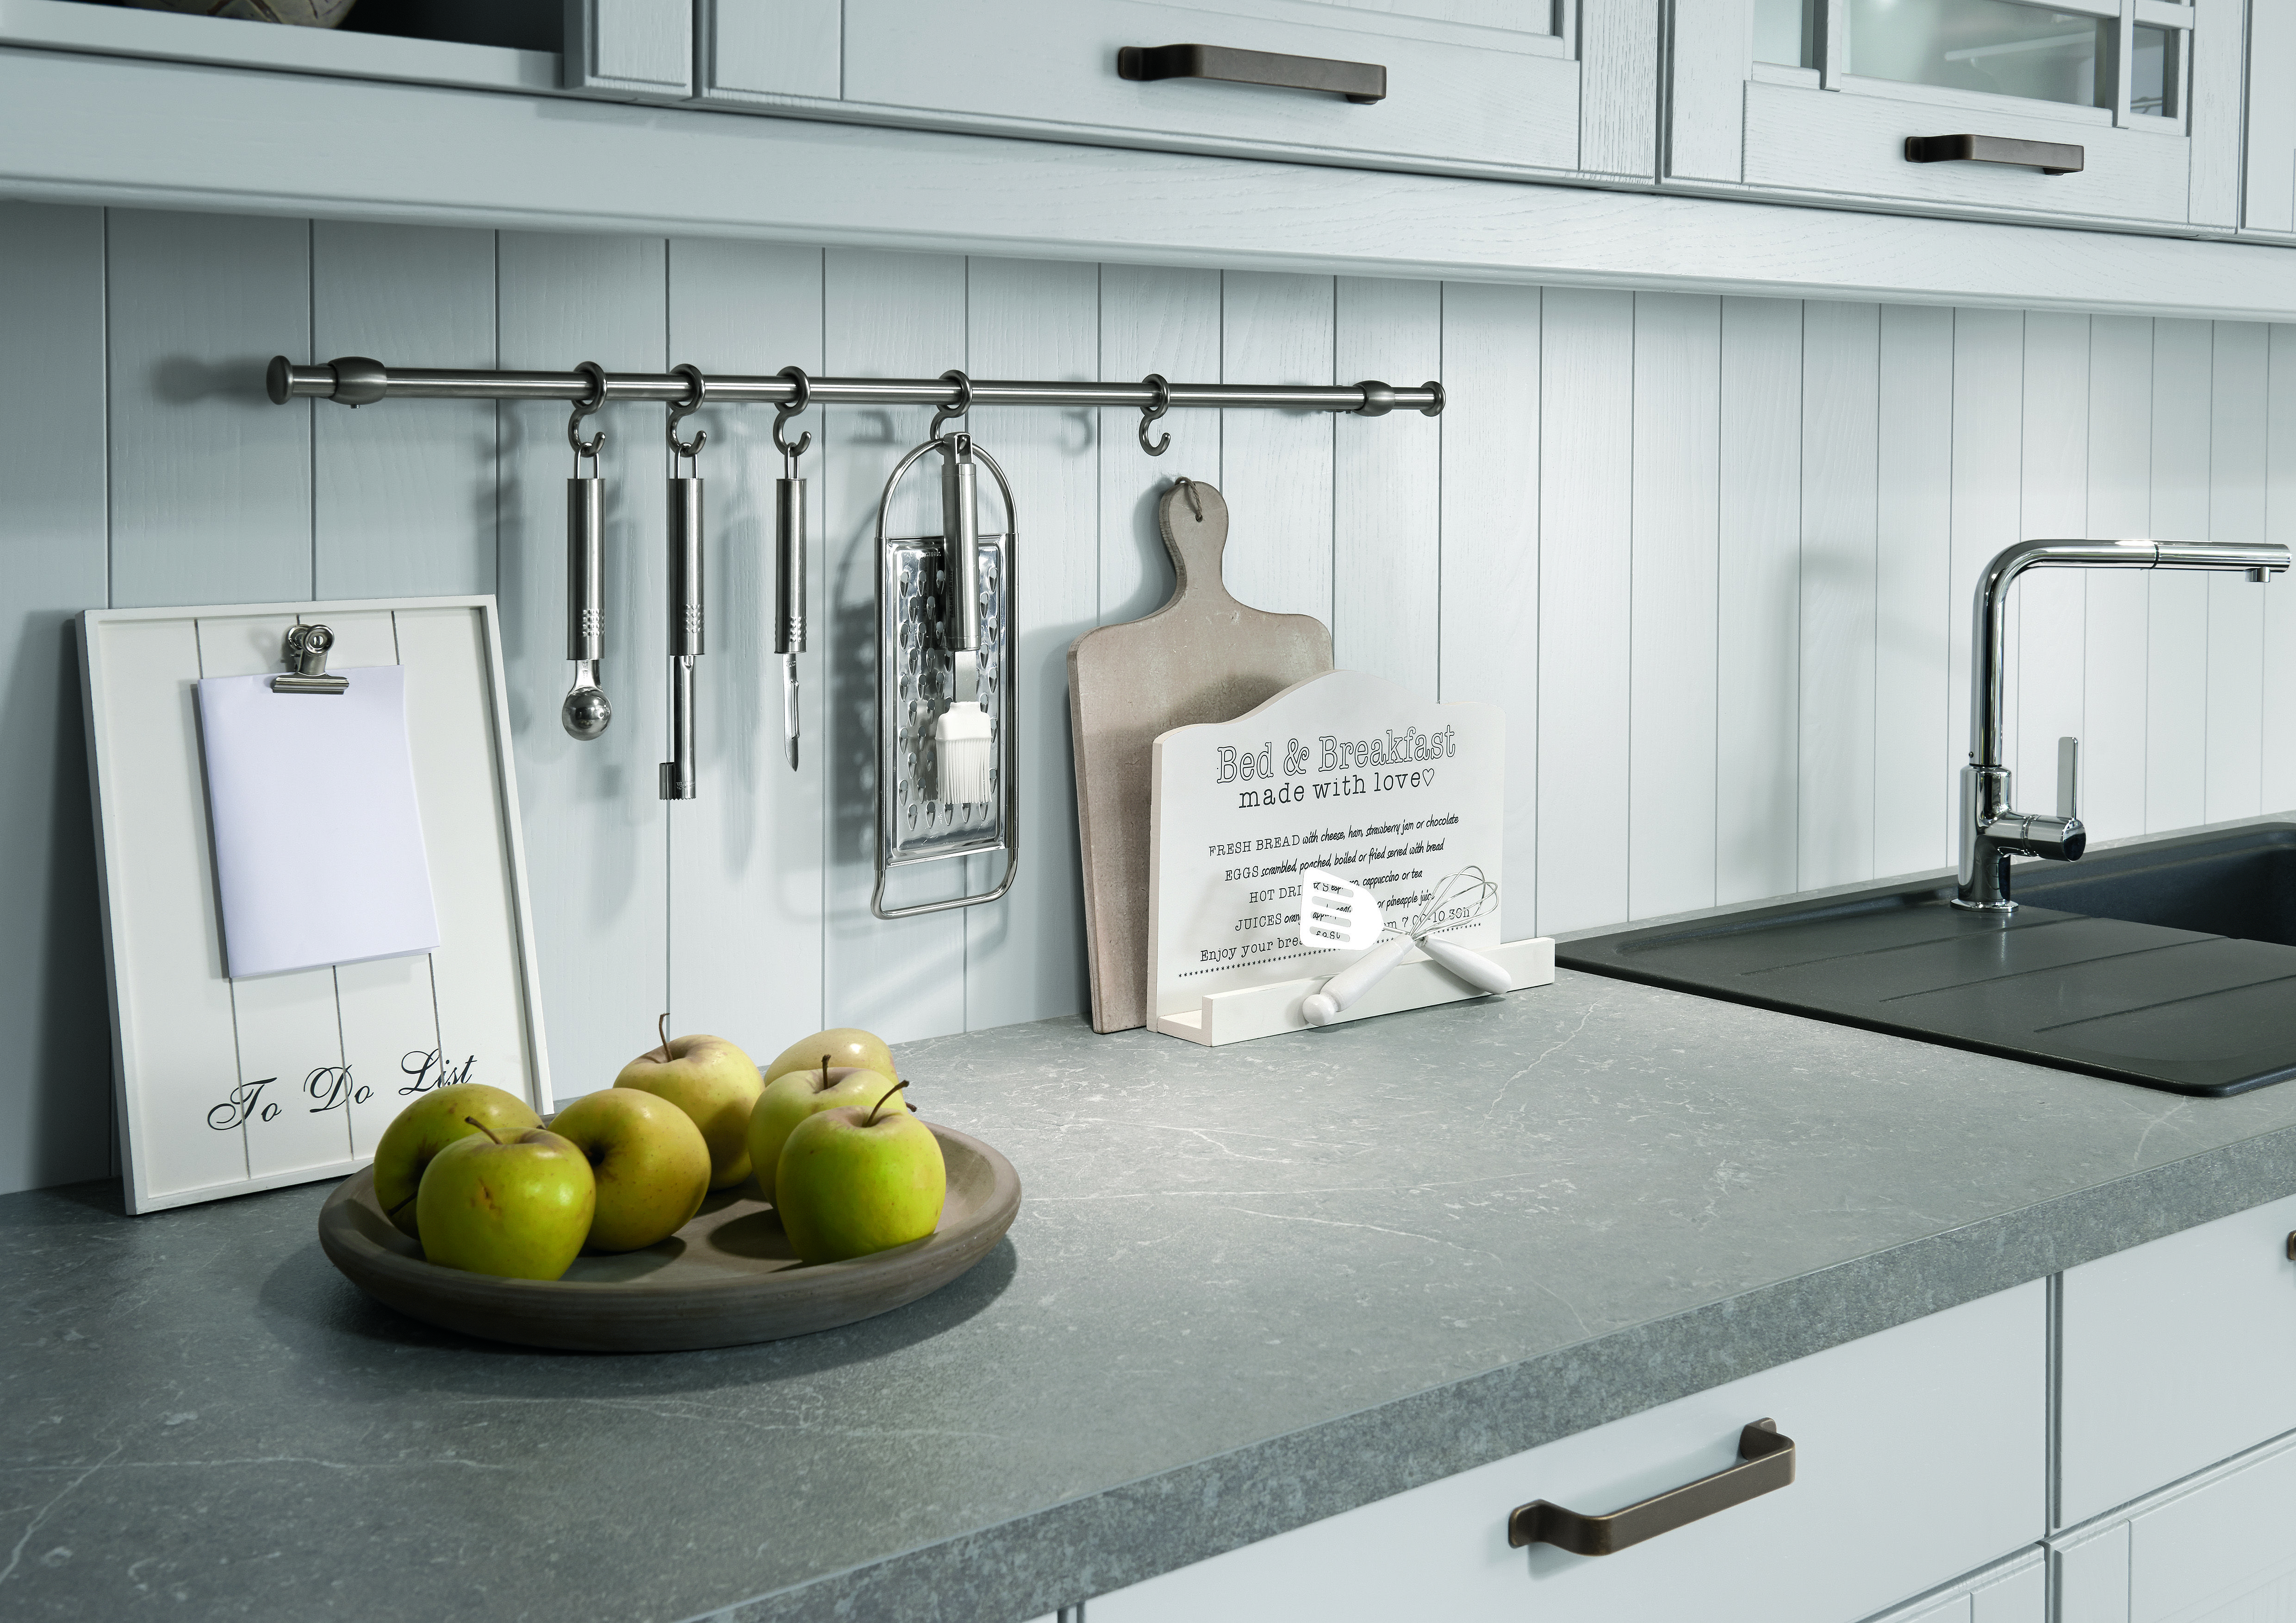 Pin by Denisa Ceclan on Kitchen   Pinterest   Kitchens